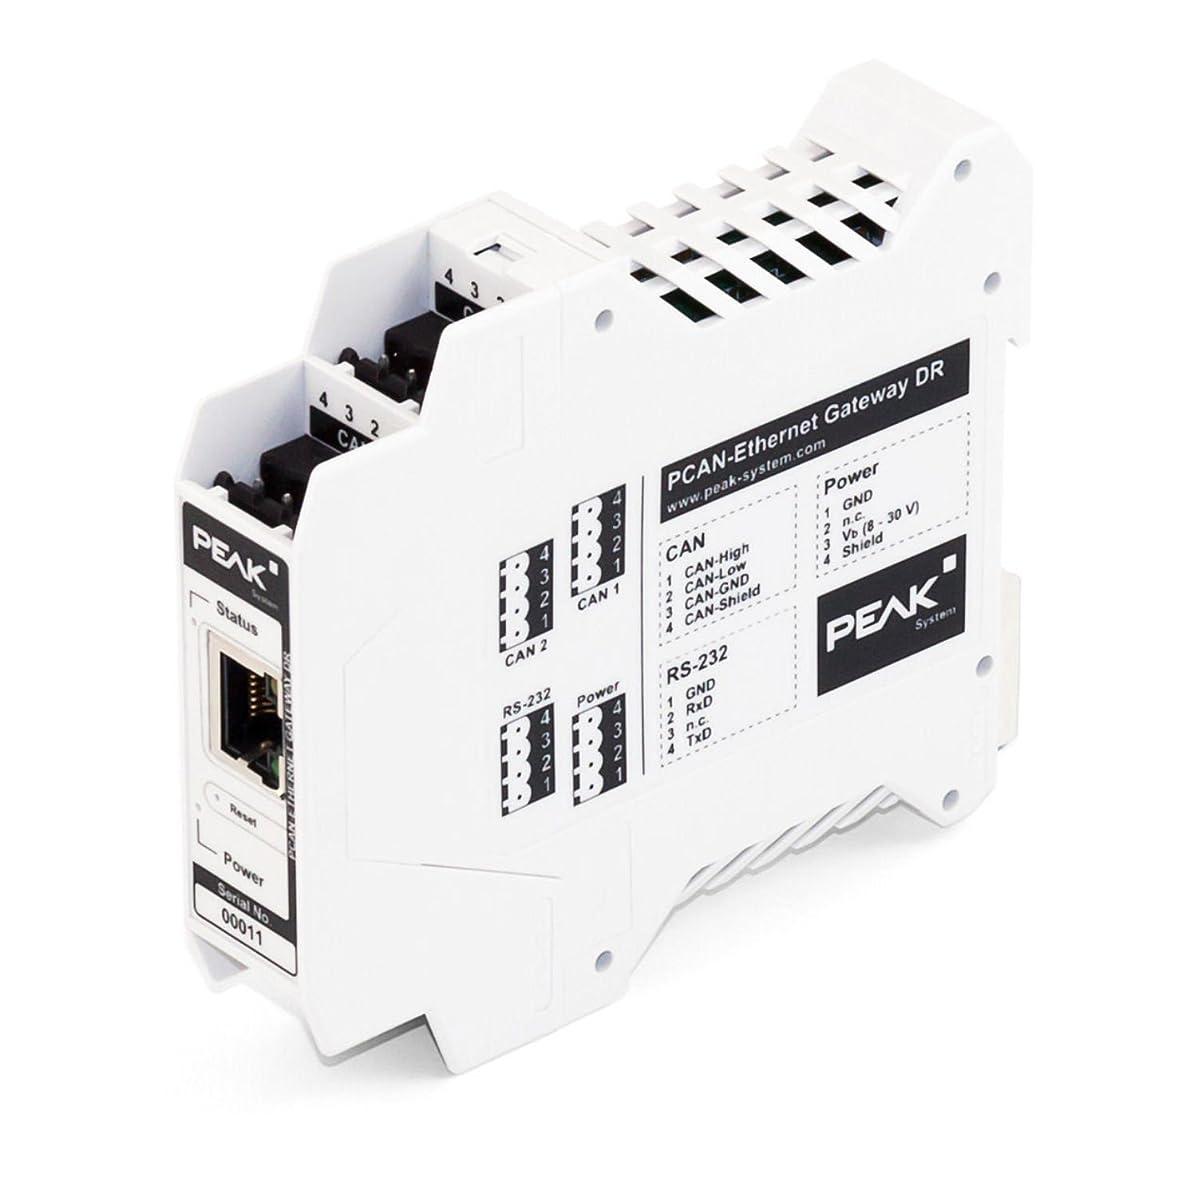 CAN Ethernet Gateway DR – IPEH-004010 (GC-CAN-ENET-GW)